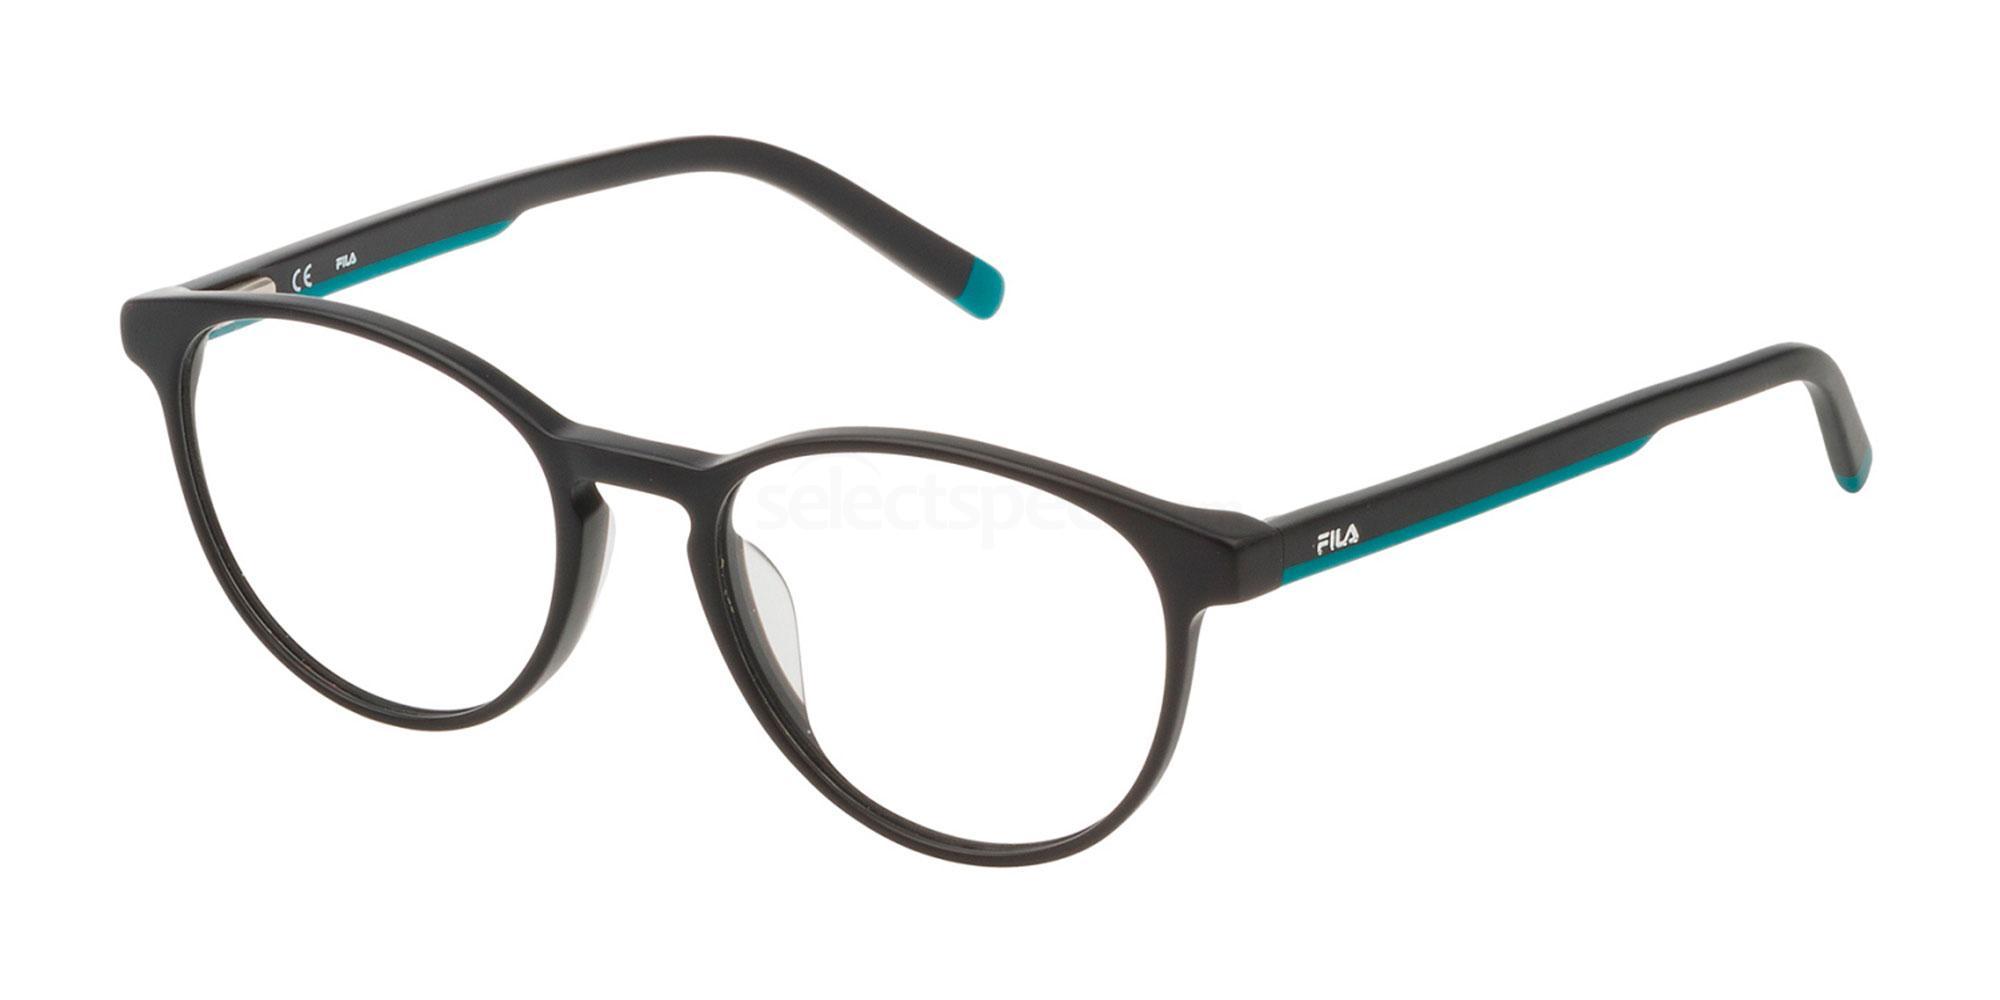 1GPM VF9241 Glasses, Fila